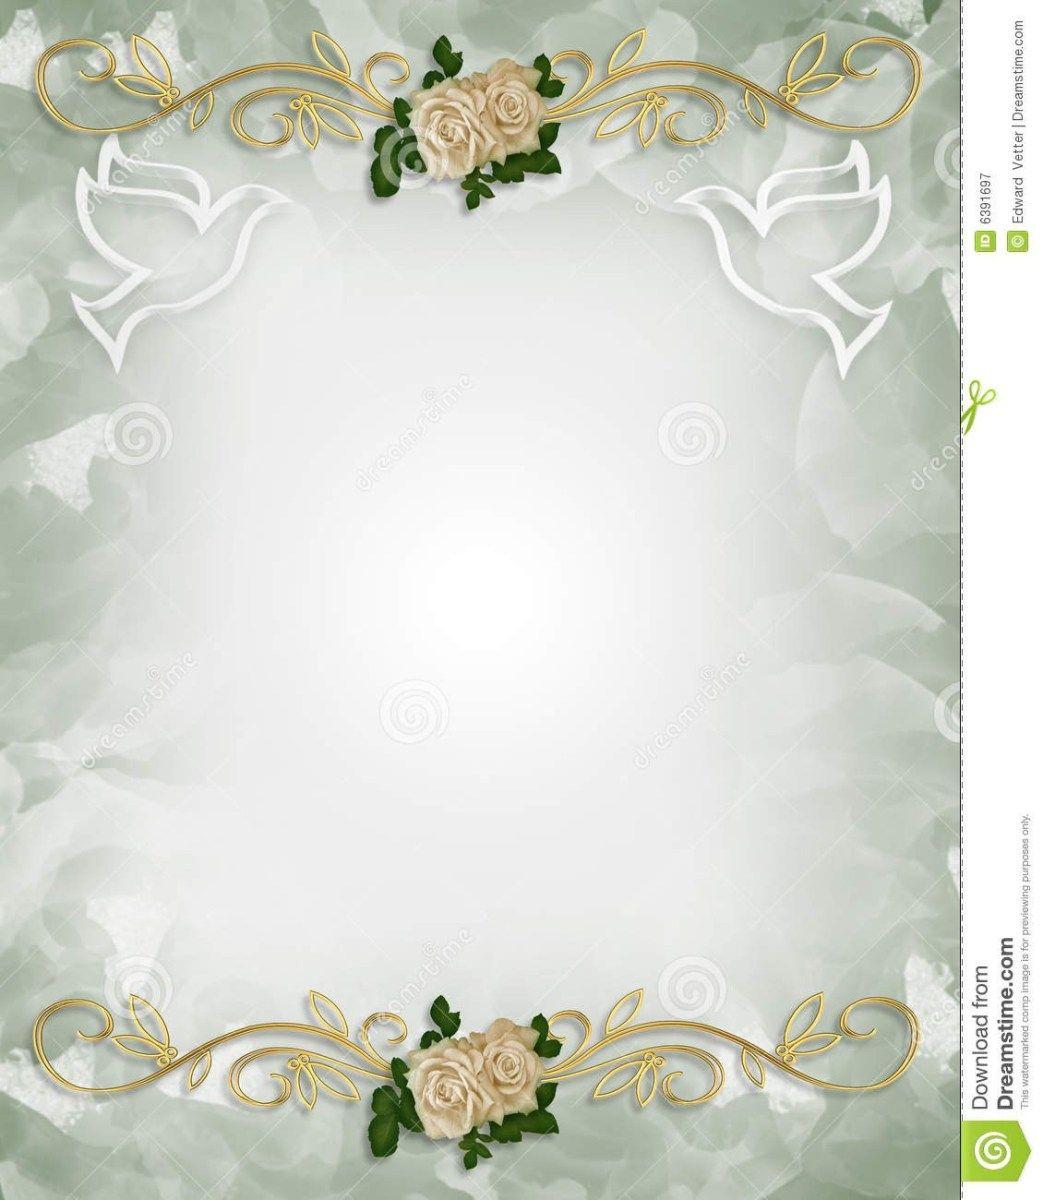 Download Premium Vector Of Flowers Invitation Card Template Vector 679715 Flower Invitation Card Wedding Invitation Card Design Flower Invitation